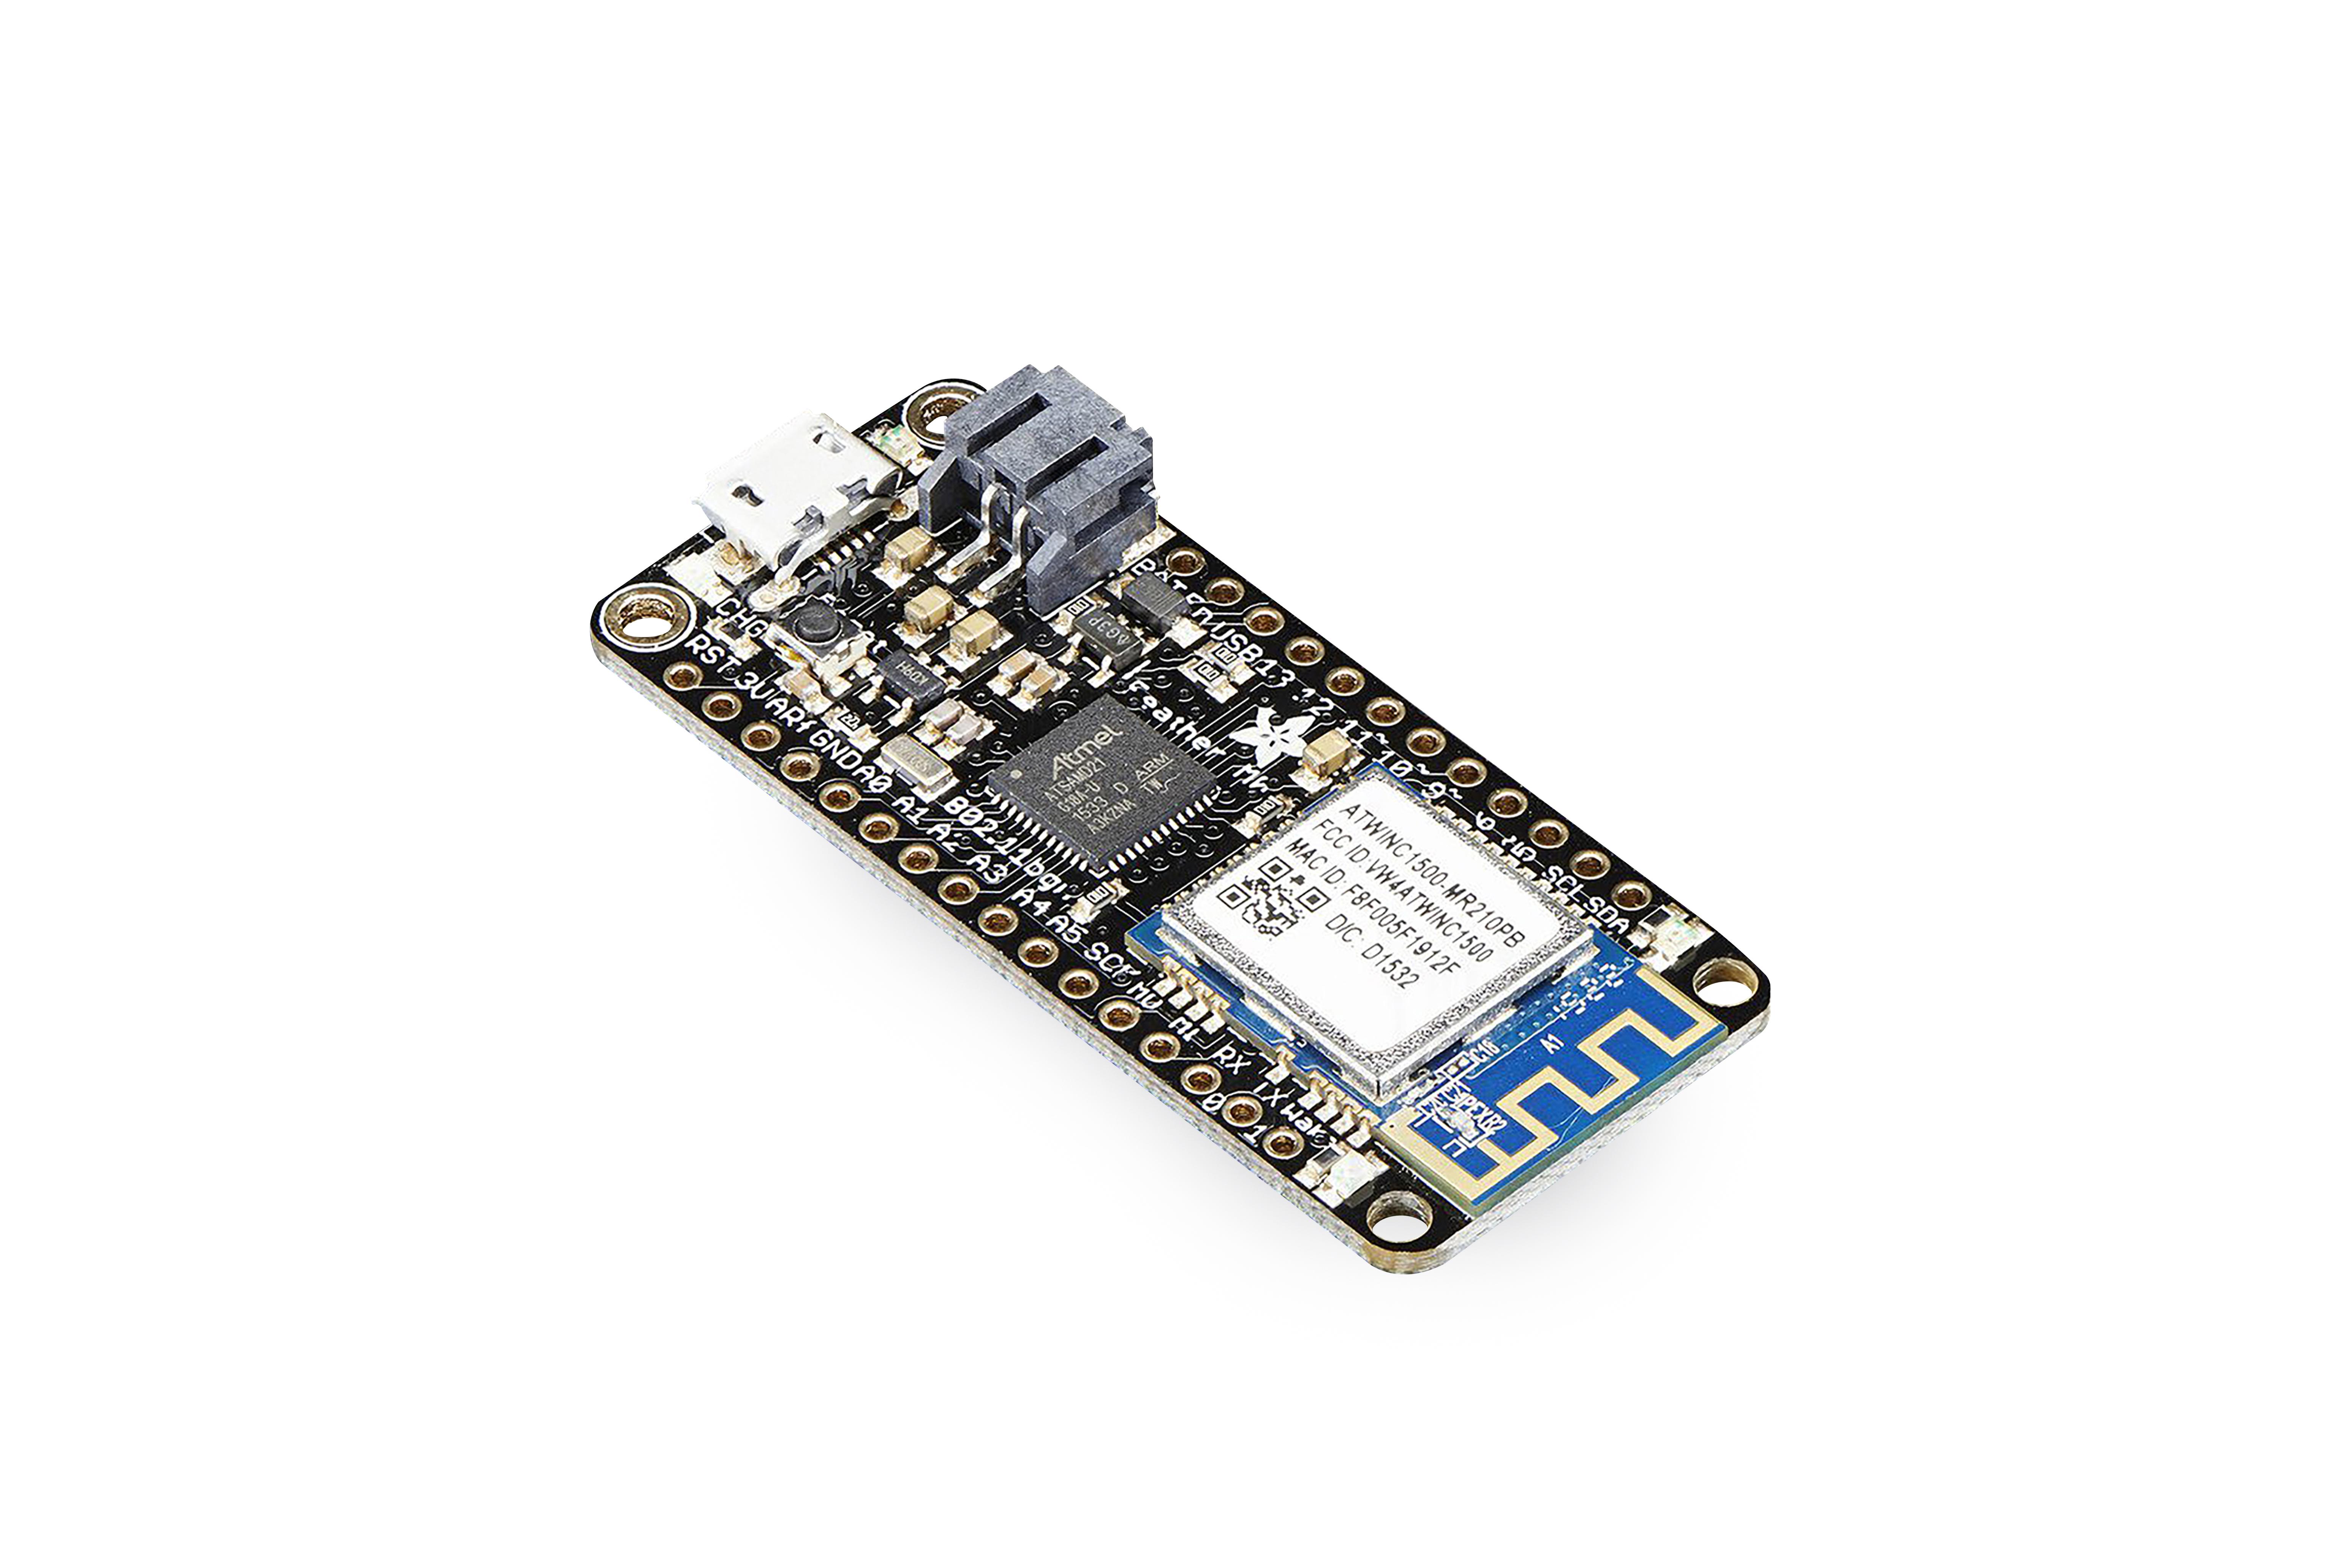 Adafruit Feather(アダフルーツ・フェザー)M0 WiFi開発ボード